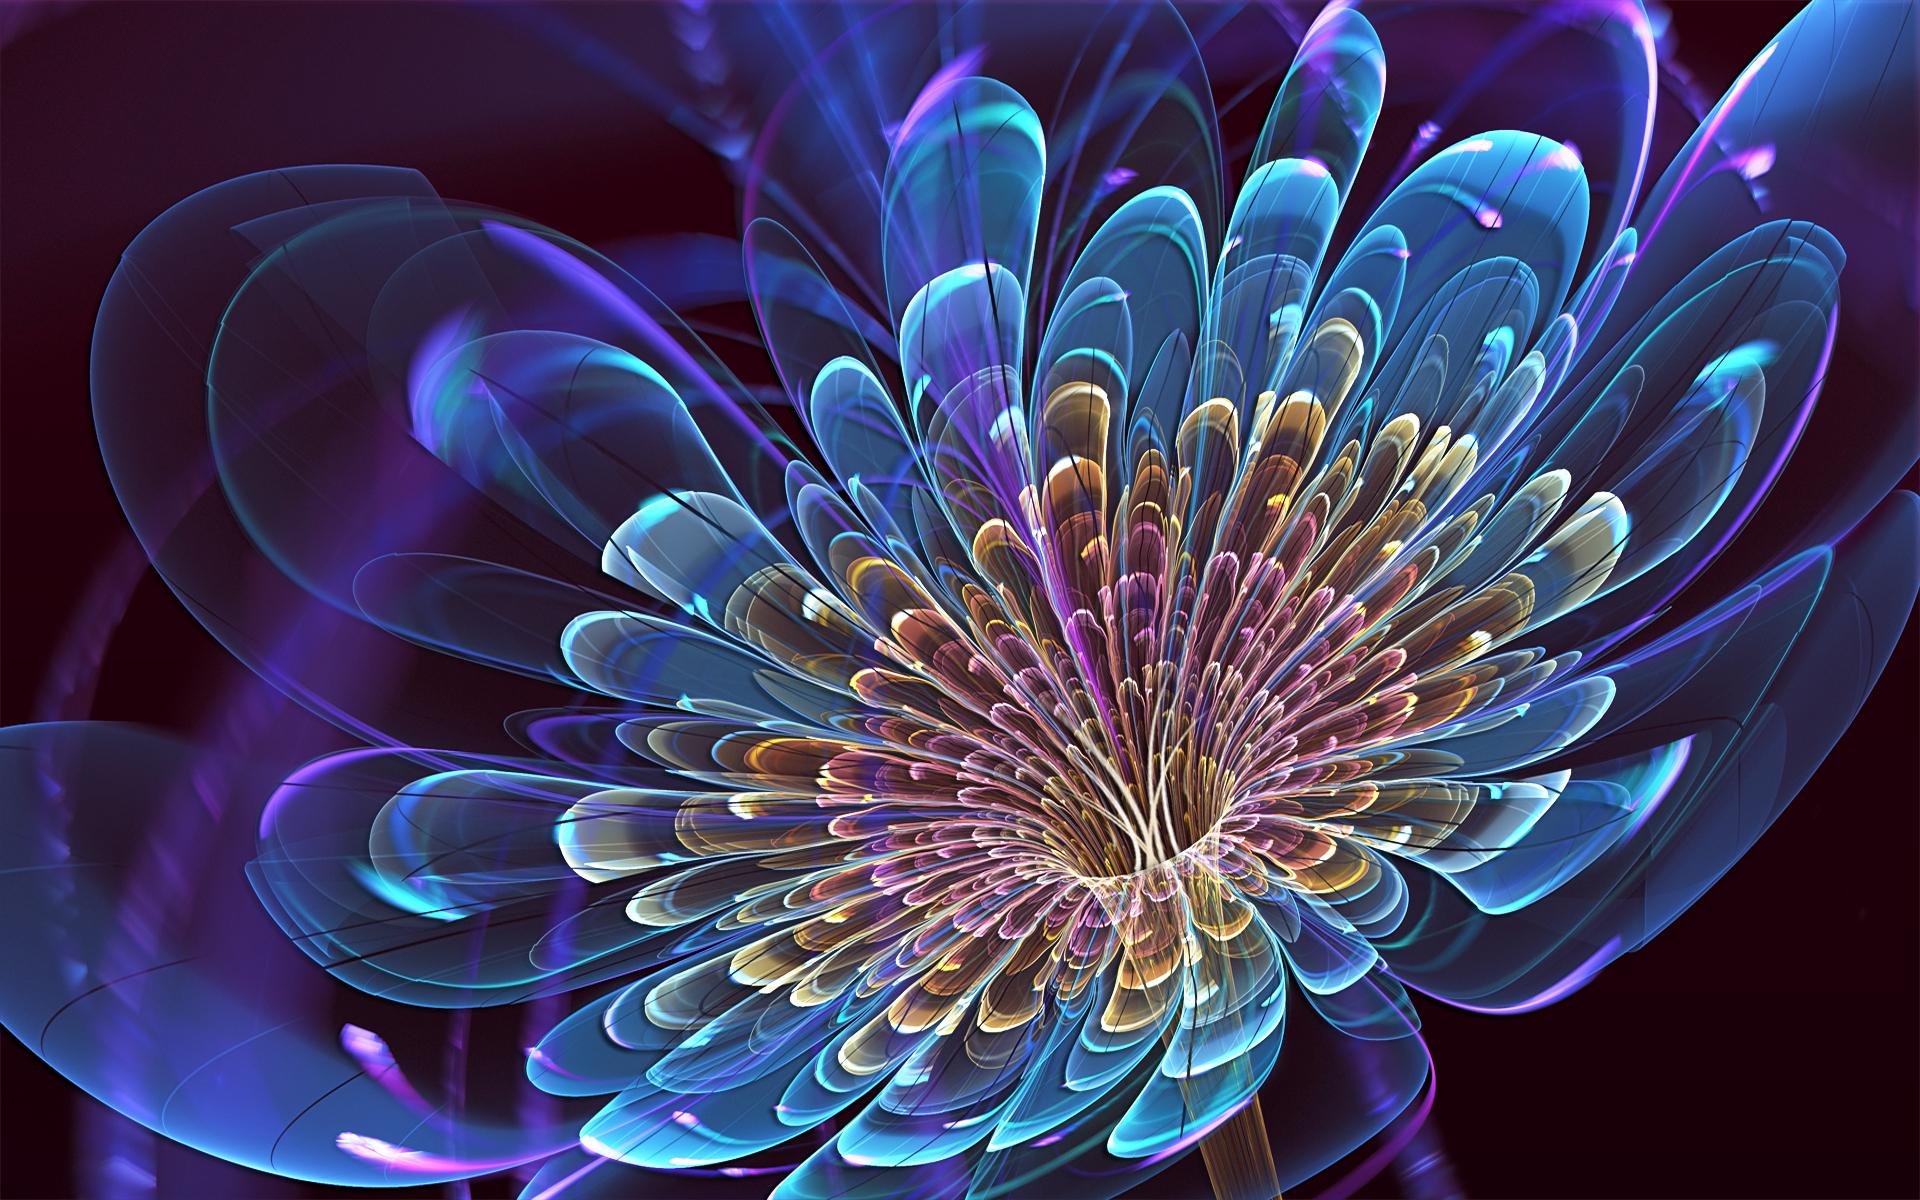 графика космос цветы роза graphics space flowers rose  № 927176 бесплатно